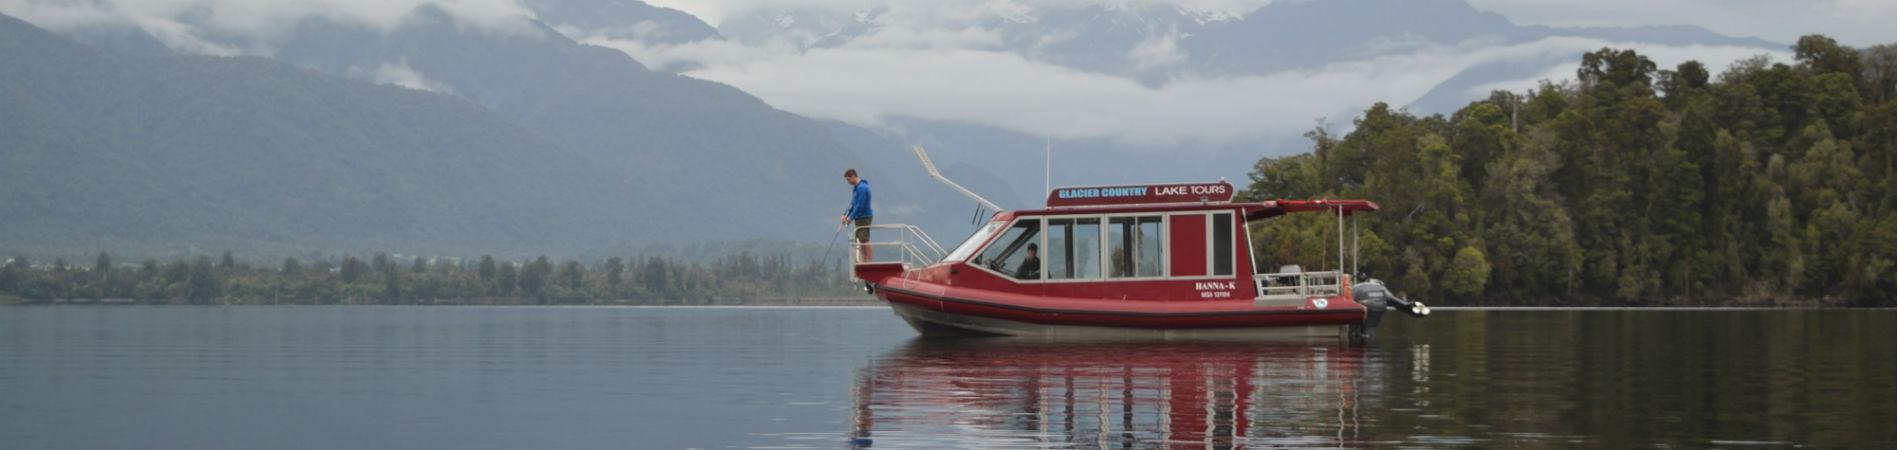 Fishing Lake Tours Mapourika